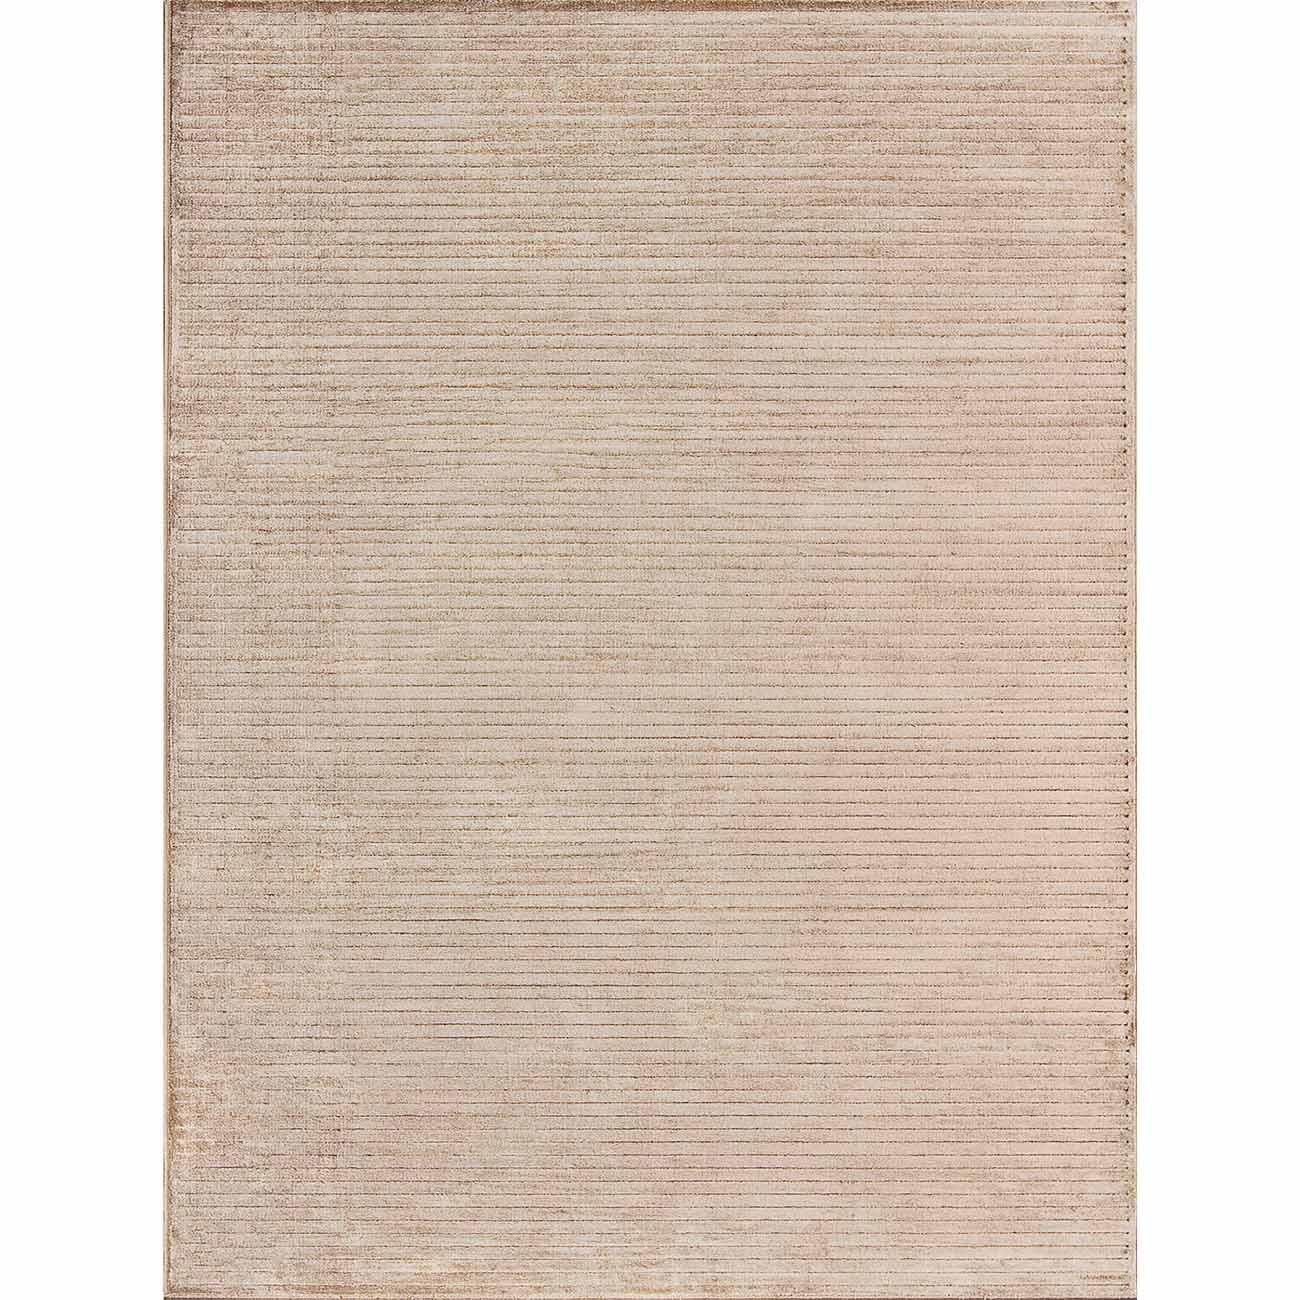 Tapete Farashe Cotele Bege Escuro 104x144